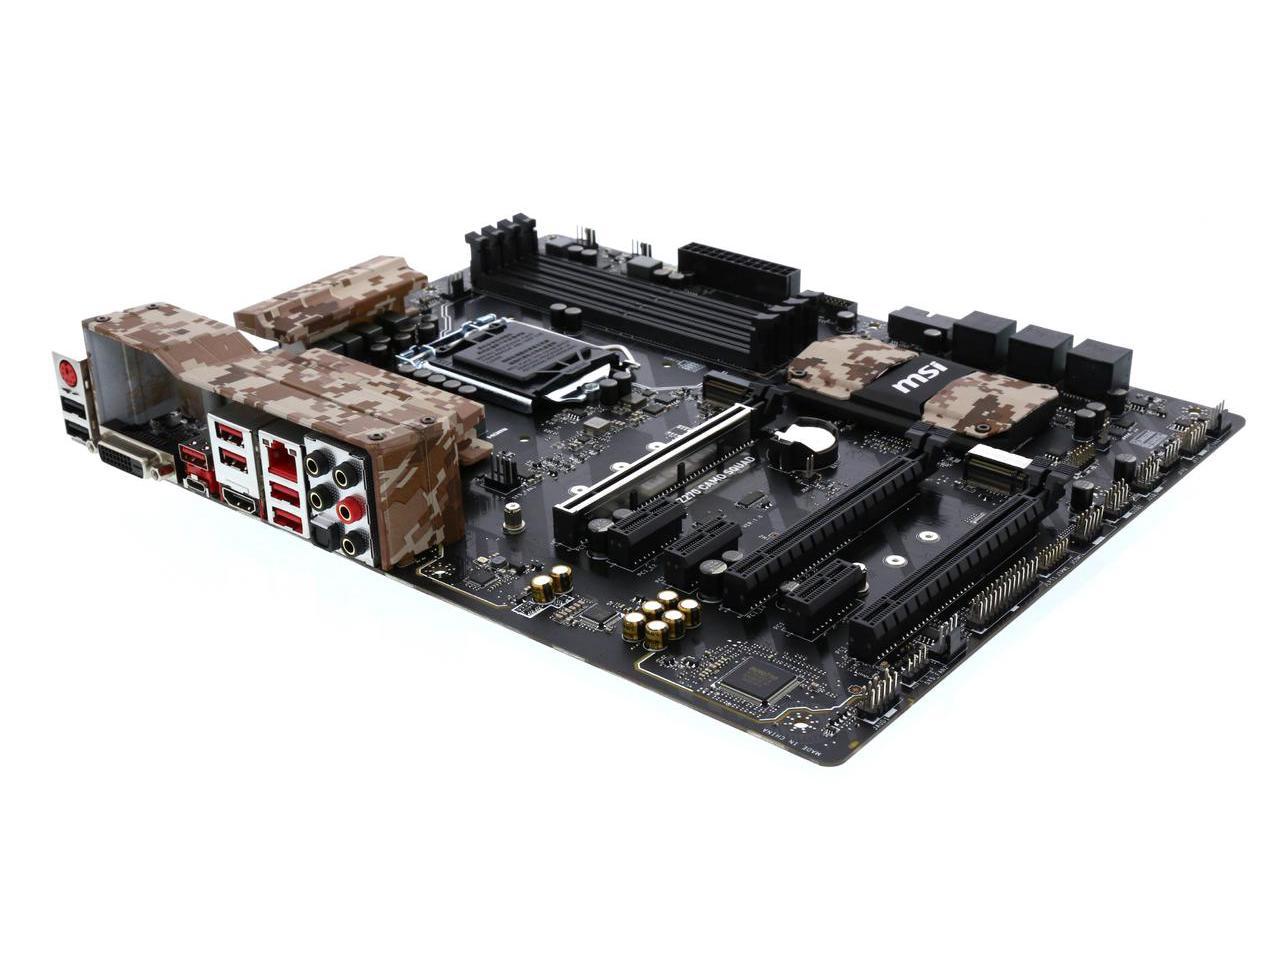 MSI Z270 CAMO SQUAD LGA 1151 Intel Z270 HDMI USB 3.1 ATX Intel Motherboard Newegg $99 AR AC